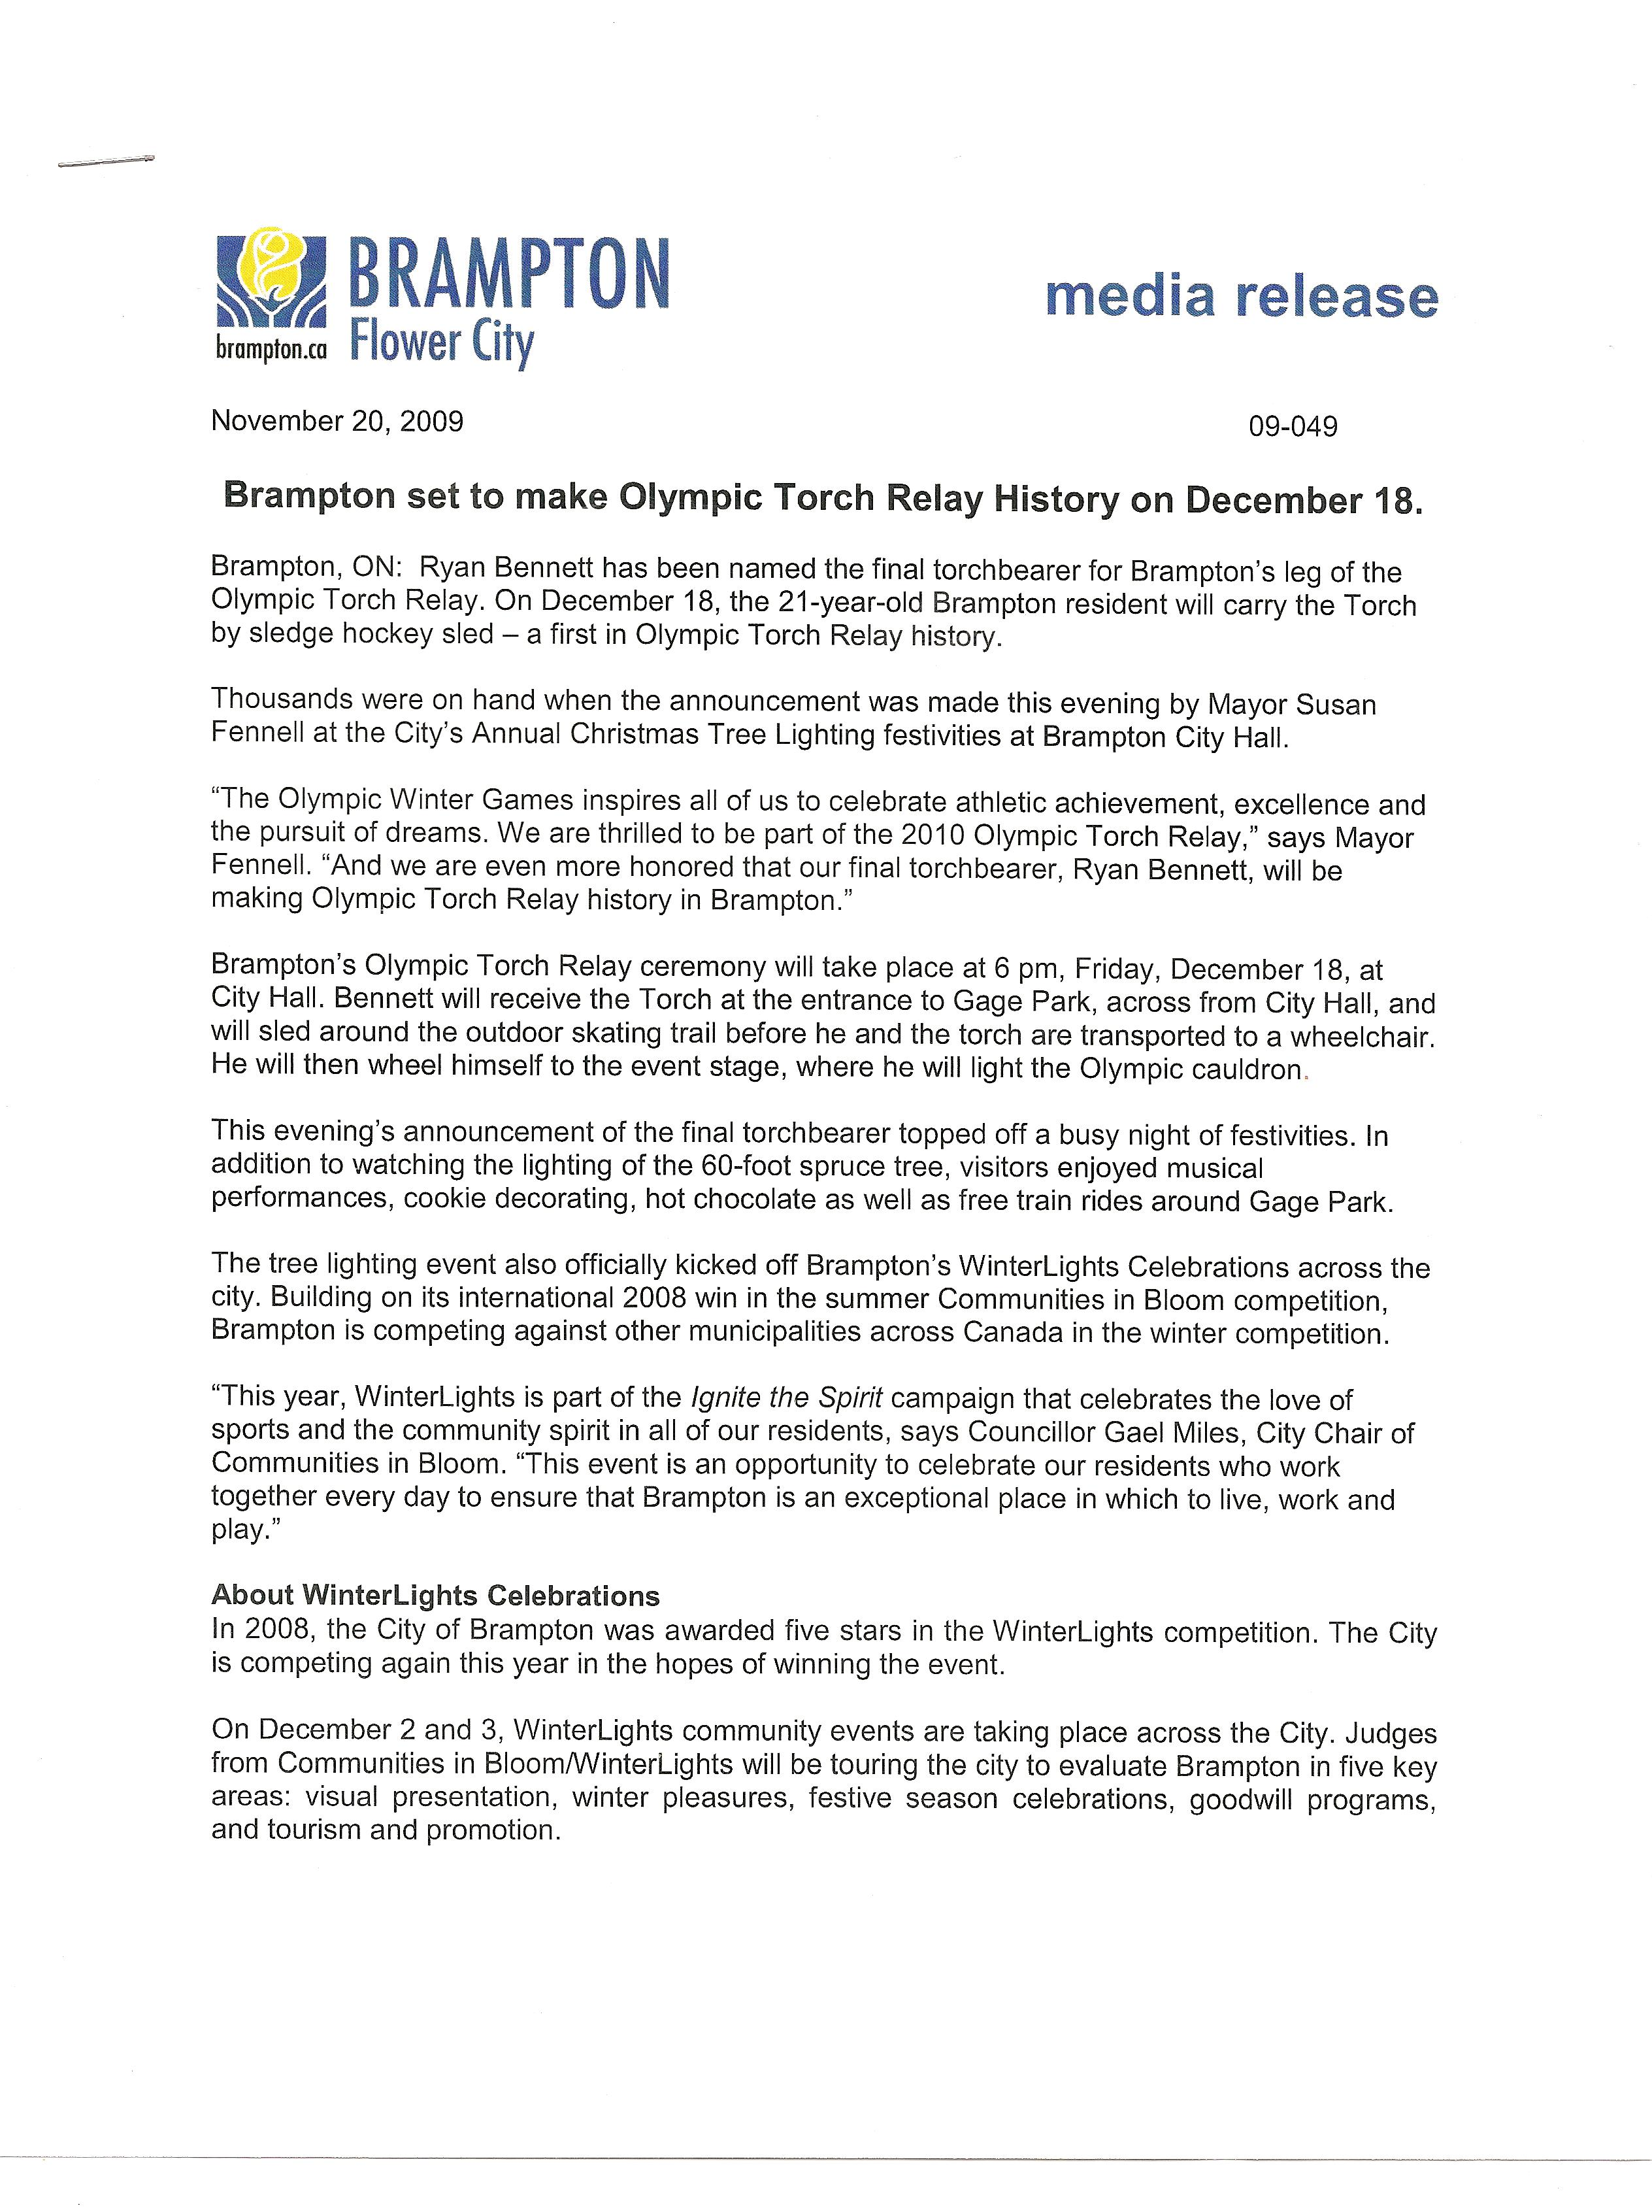 Brampton Flower City Media Release